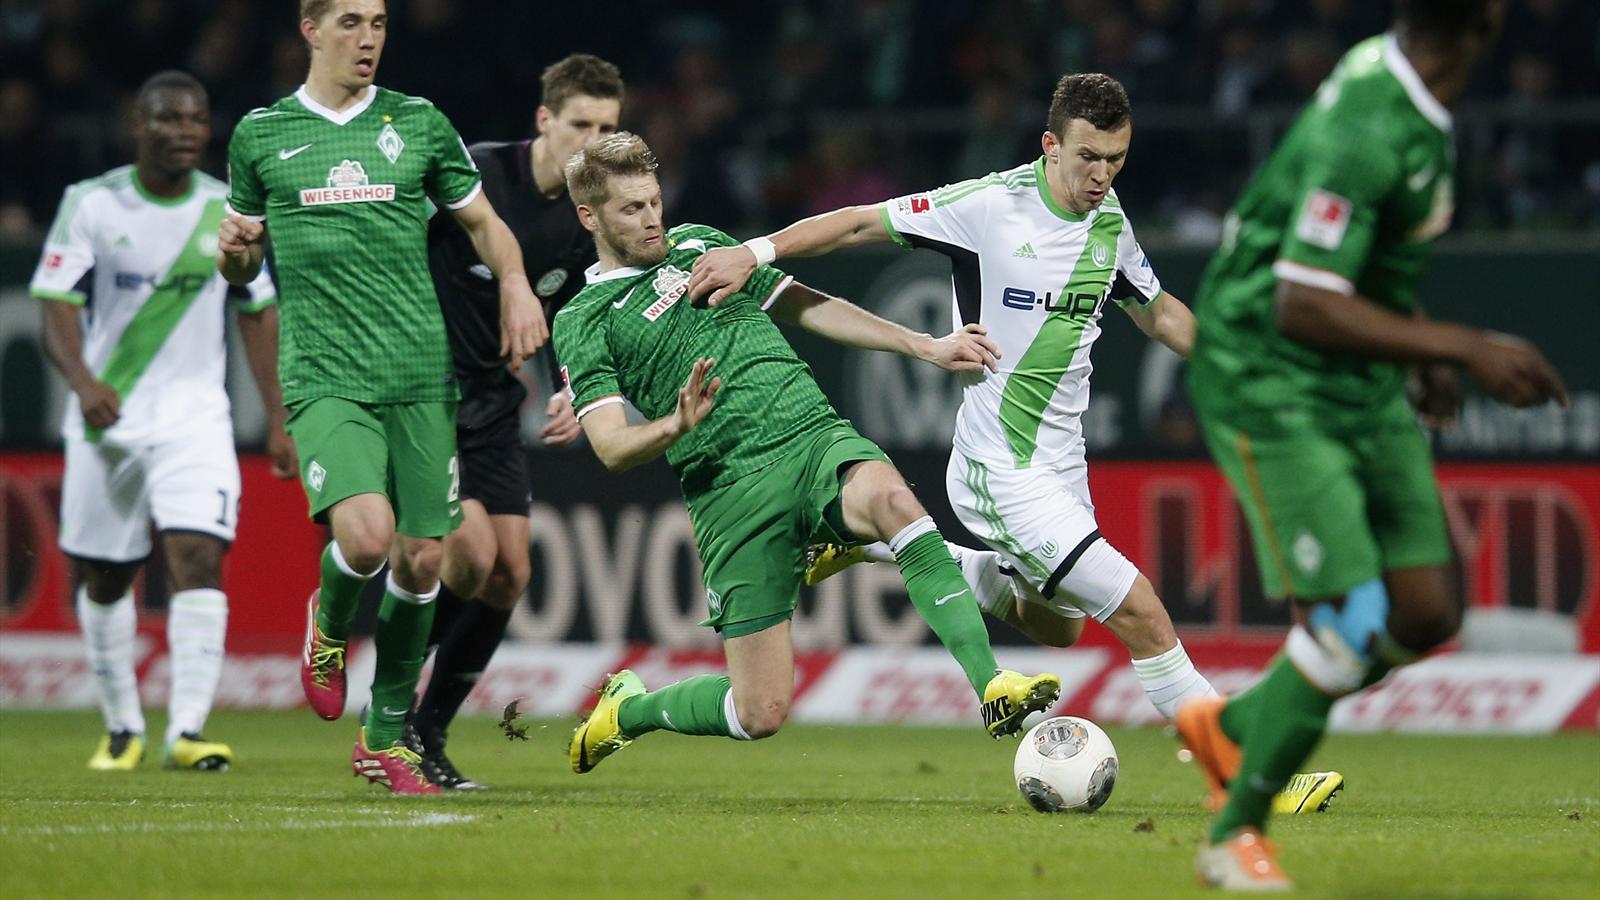 Ставки на футбол на Хоффенхайм — Гамбург. Ставки на чемпионат Германии 14 Апреля 2018